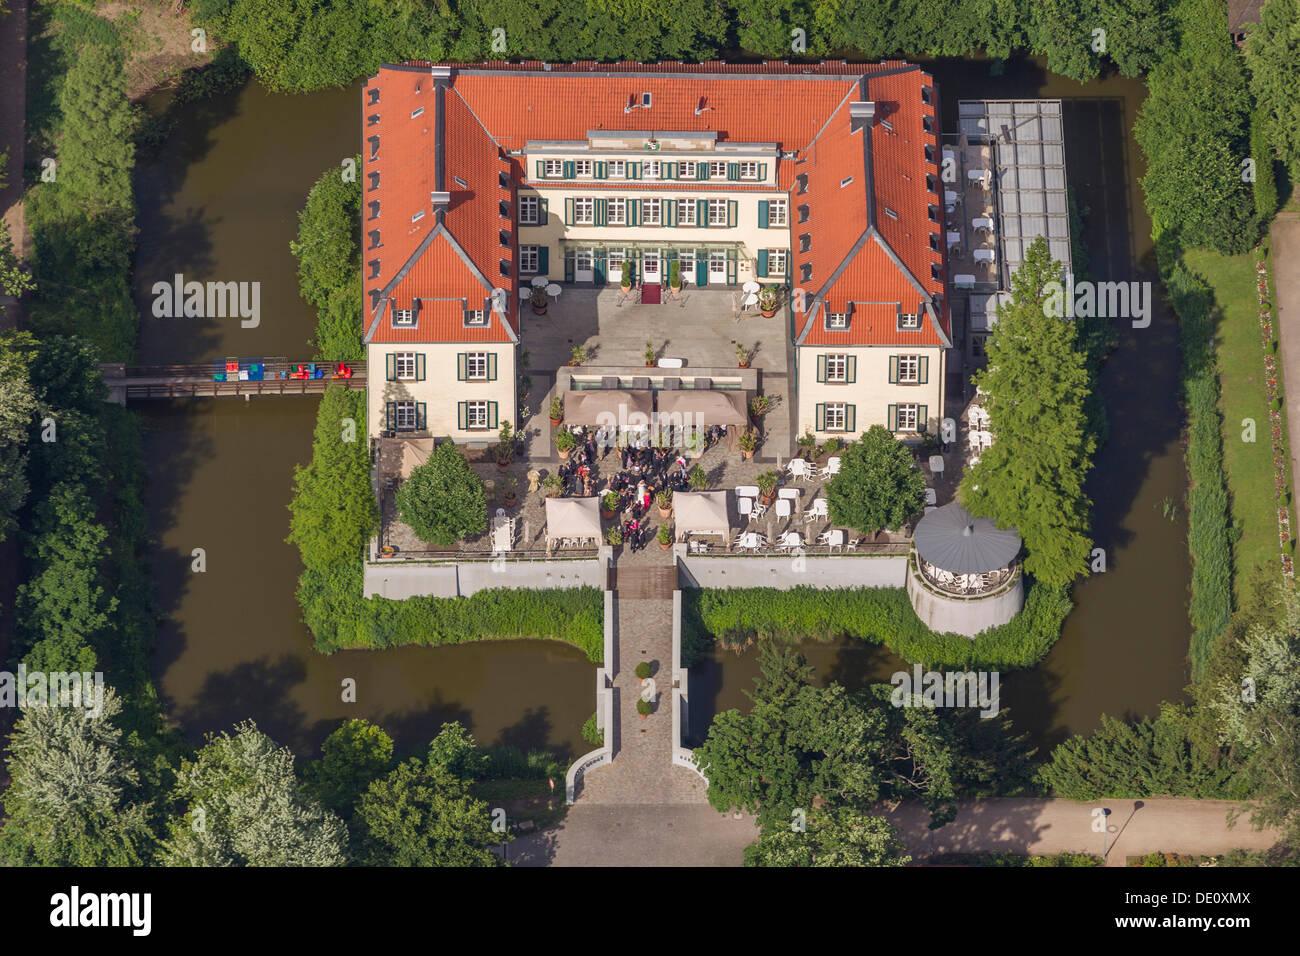 Vista aérea, una fiesta de boda en Berge moated castillo, Gelsenkirchen, área de Ruhr, Renania del Norte-Westfalia Foto de stock